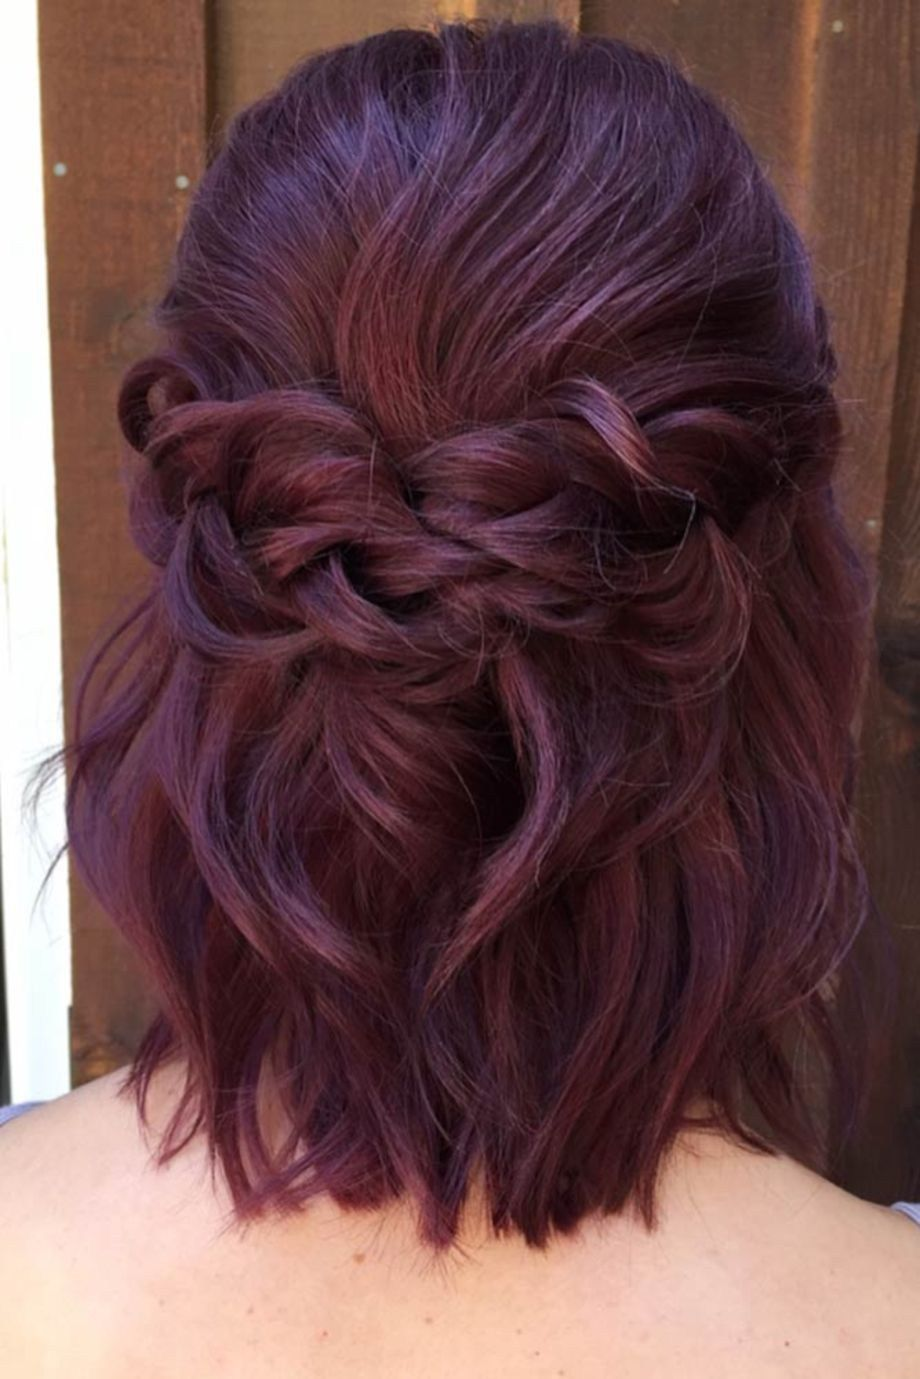 Stunning Wedding Hairstyles Ideas For Shoulder Length Hair 28 Weddinghairstyles Braided Hairstyles For Wedding Wedding Hair Down Wedding Hair Half